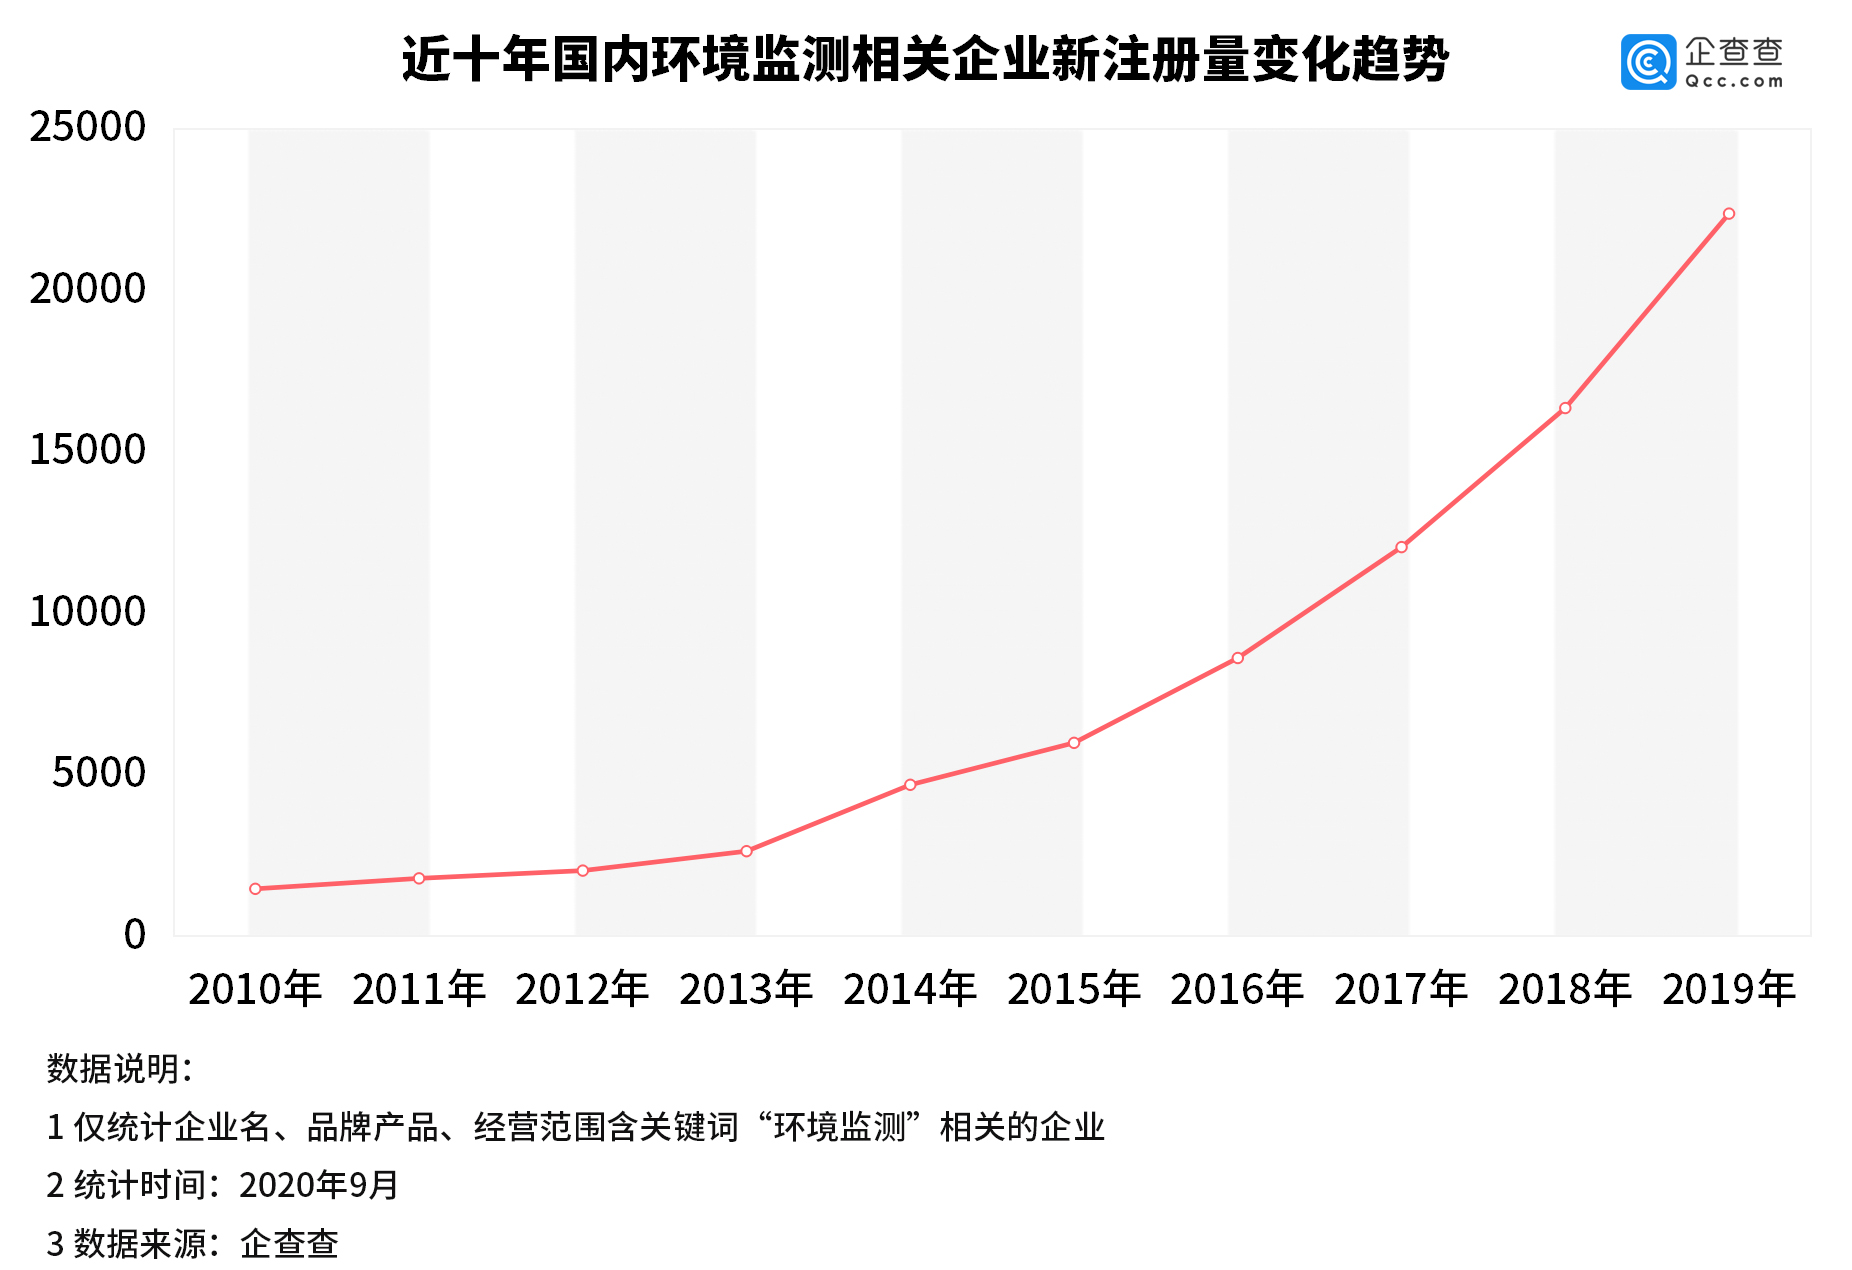 <strong>上半年中国形势监测相关</strong>